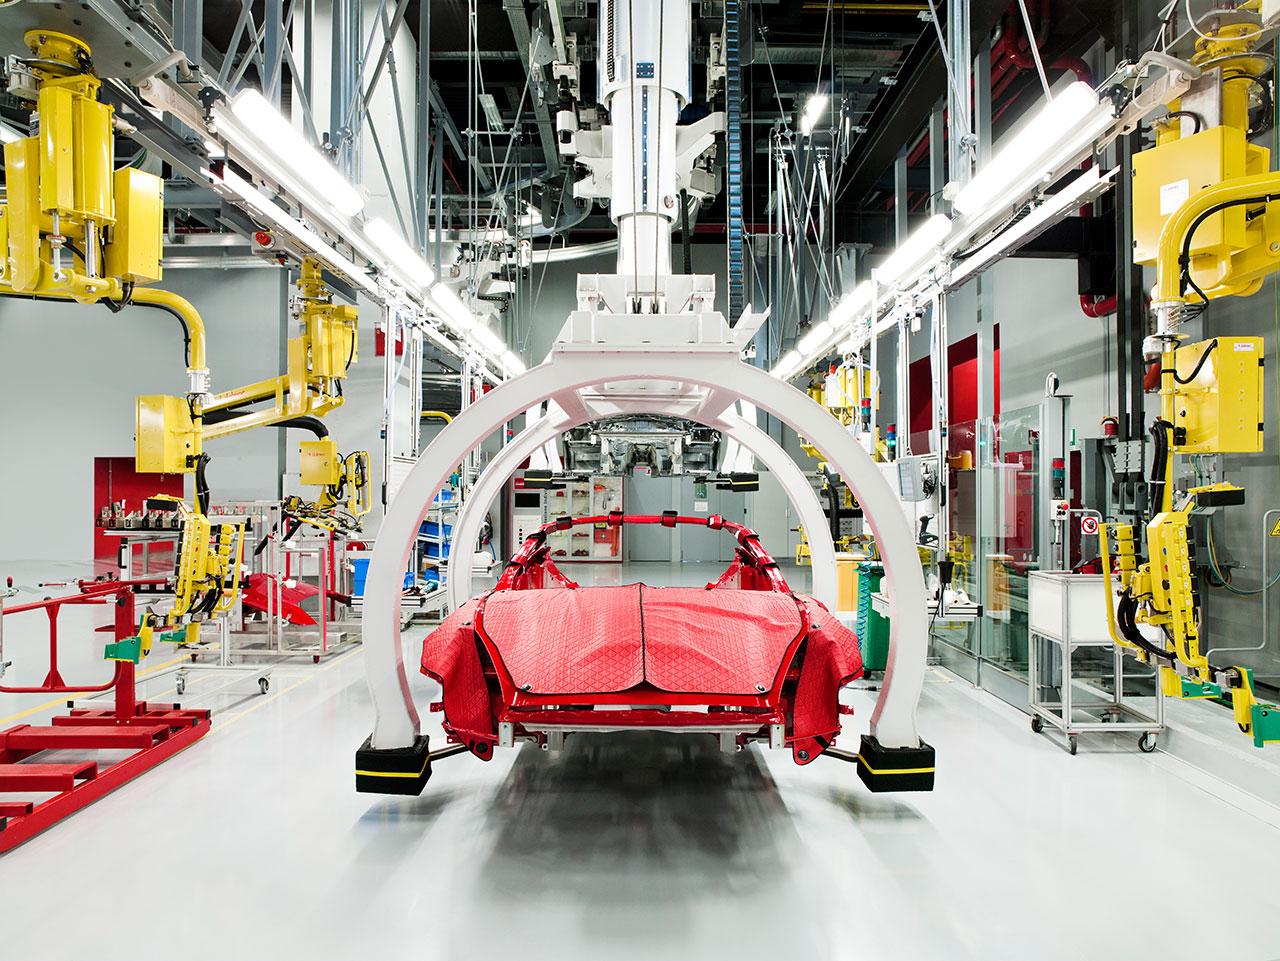 Present Day Manufacturing of the Ferrari California car. Photo courtesy of Ferrari.